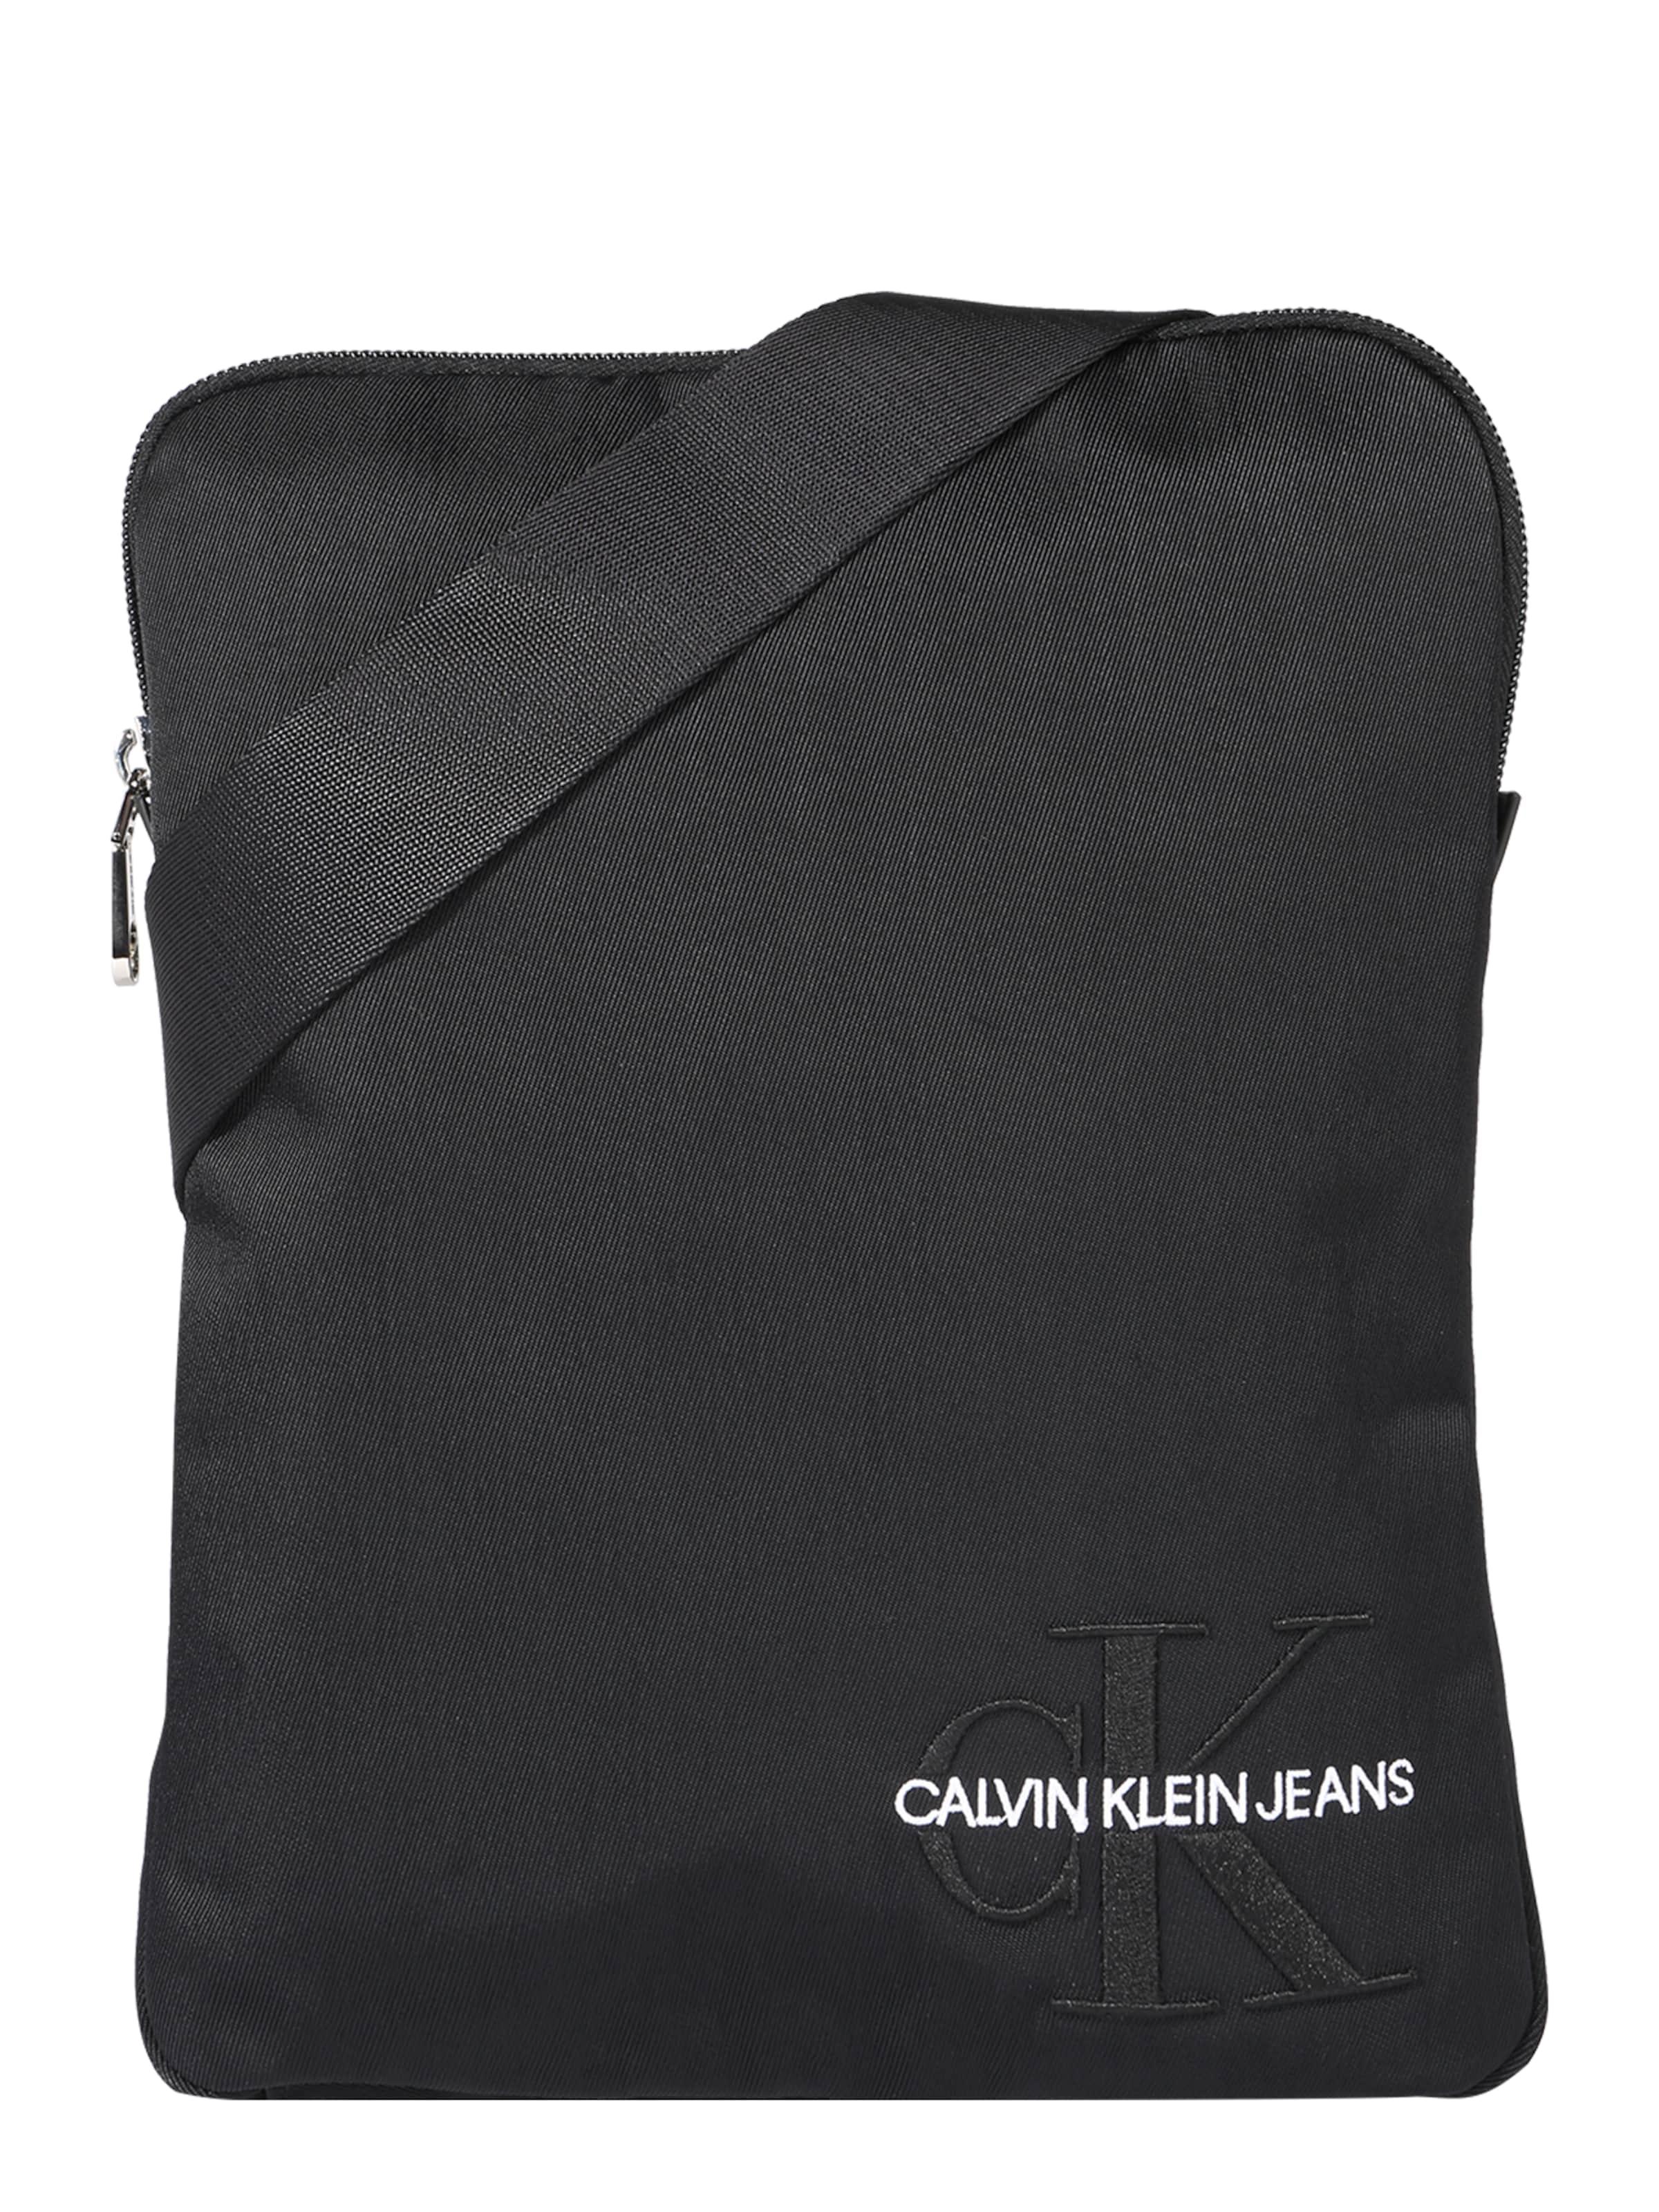 Flatpack' Klein In Schoudertas 'monogram Nylon Zwart Calvin nP0wOk8